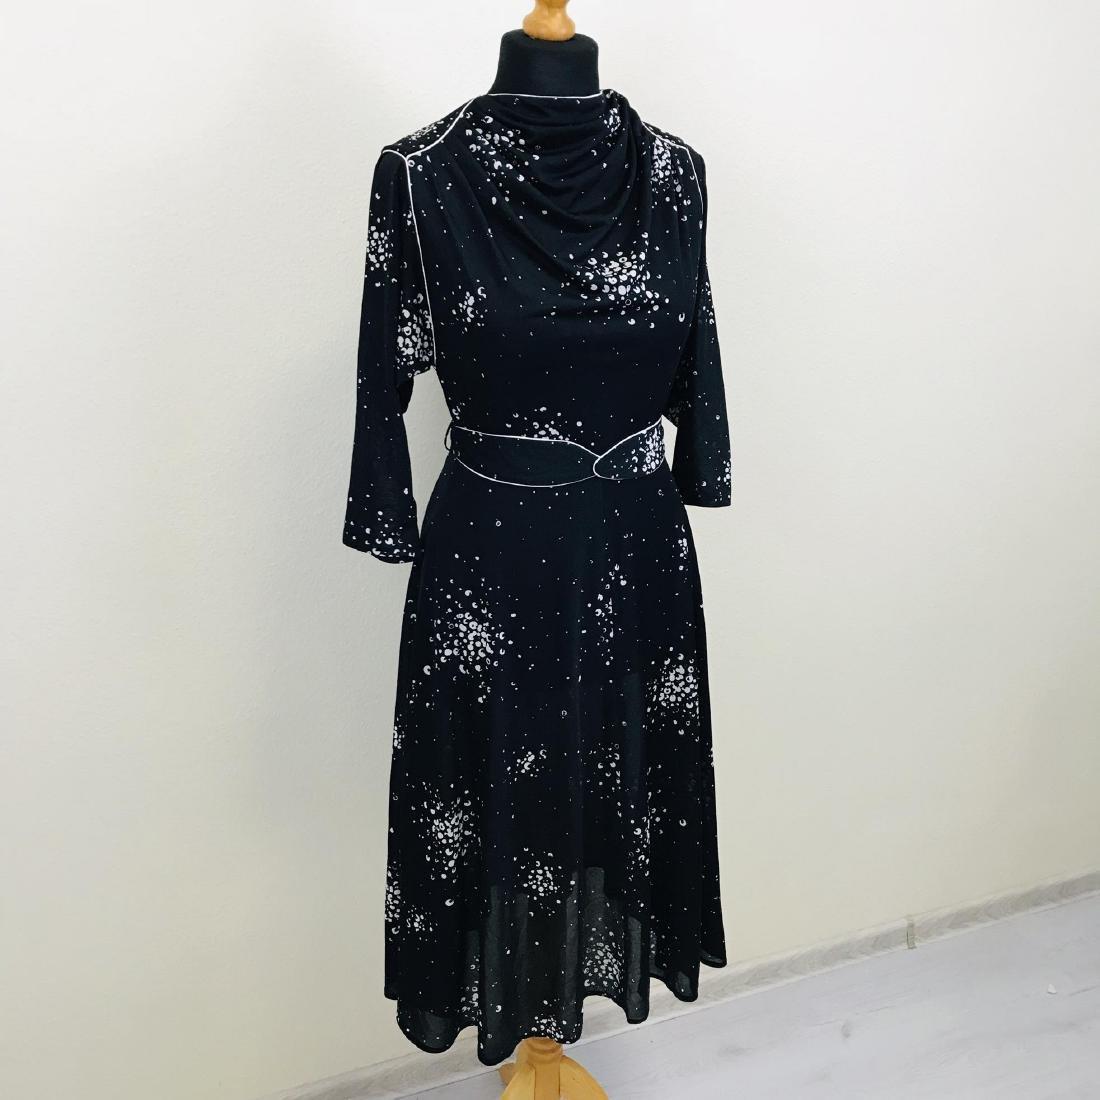 Vintage Women's Evening Dress - 2